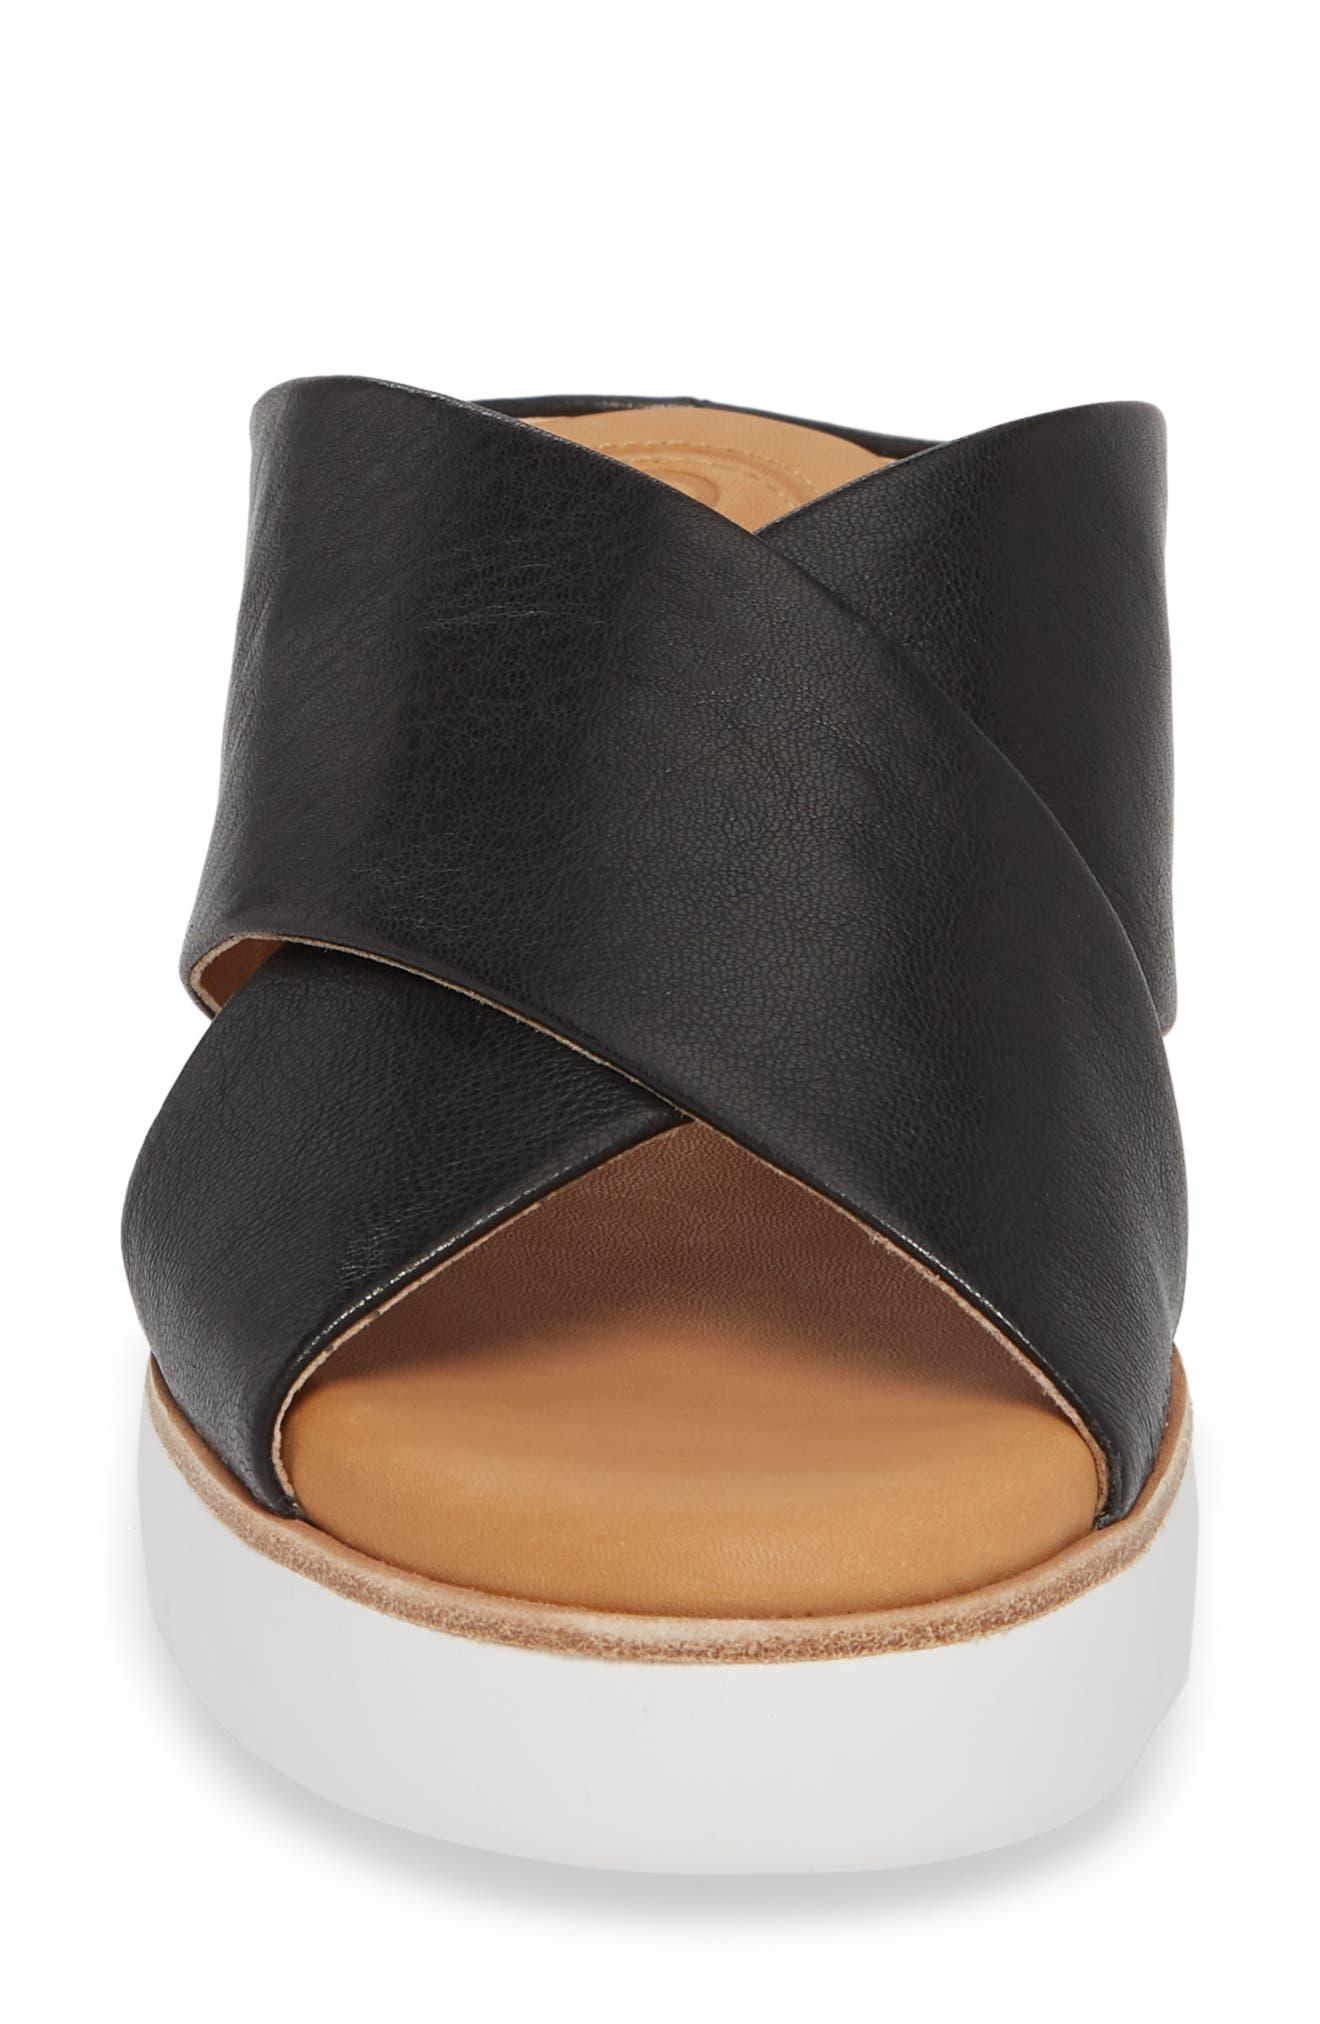 Brunna Sandal,                             Alternate thumbnail 4, color,                             Black Leather